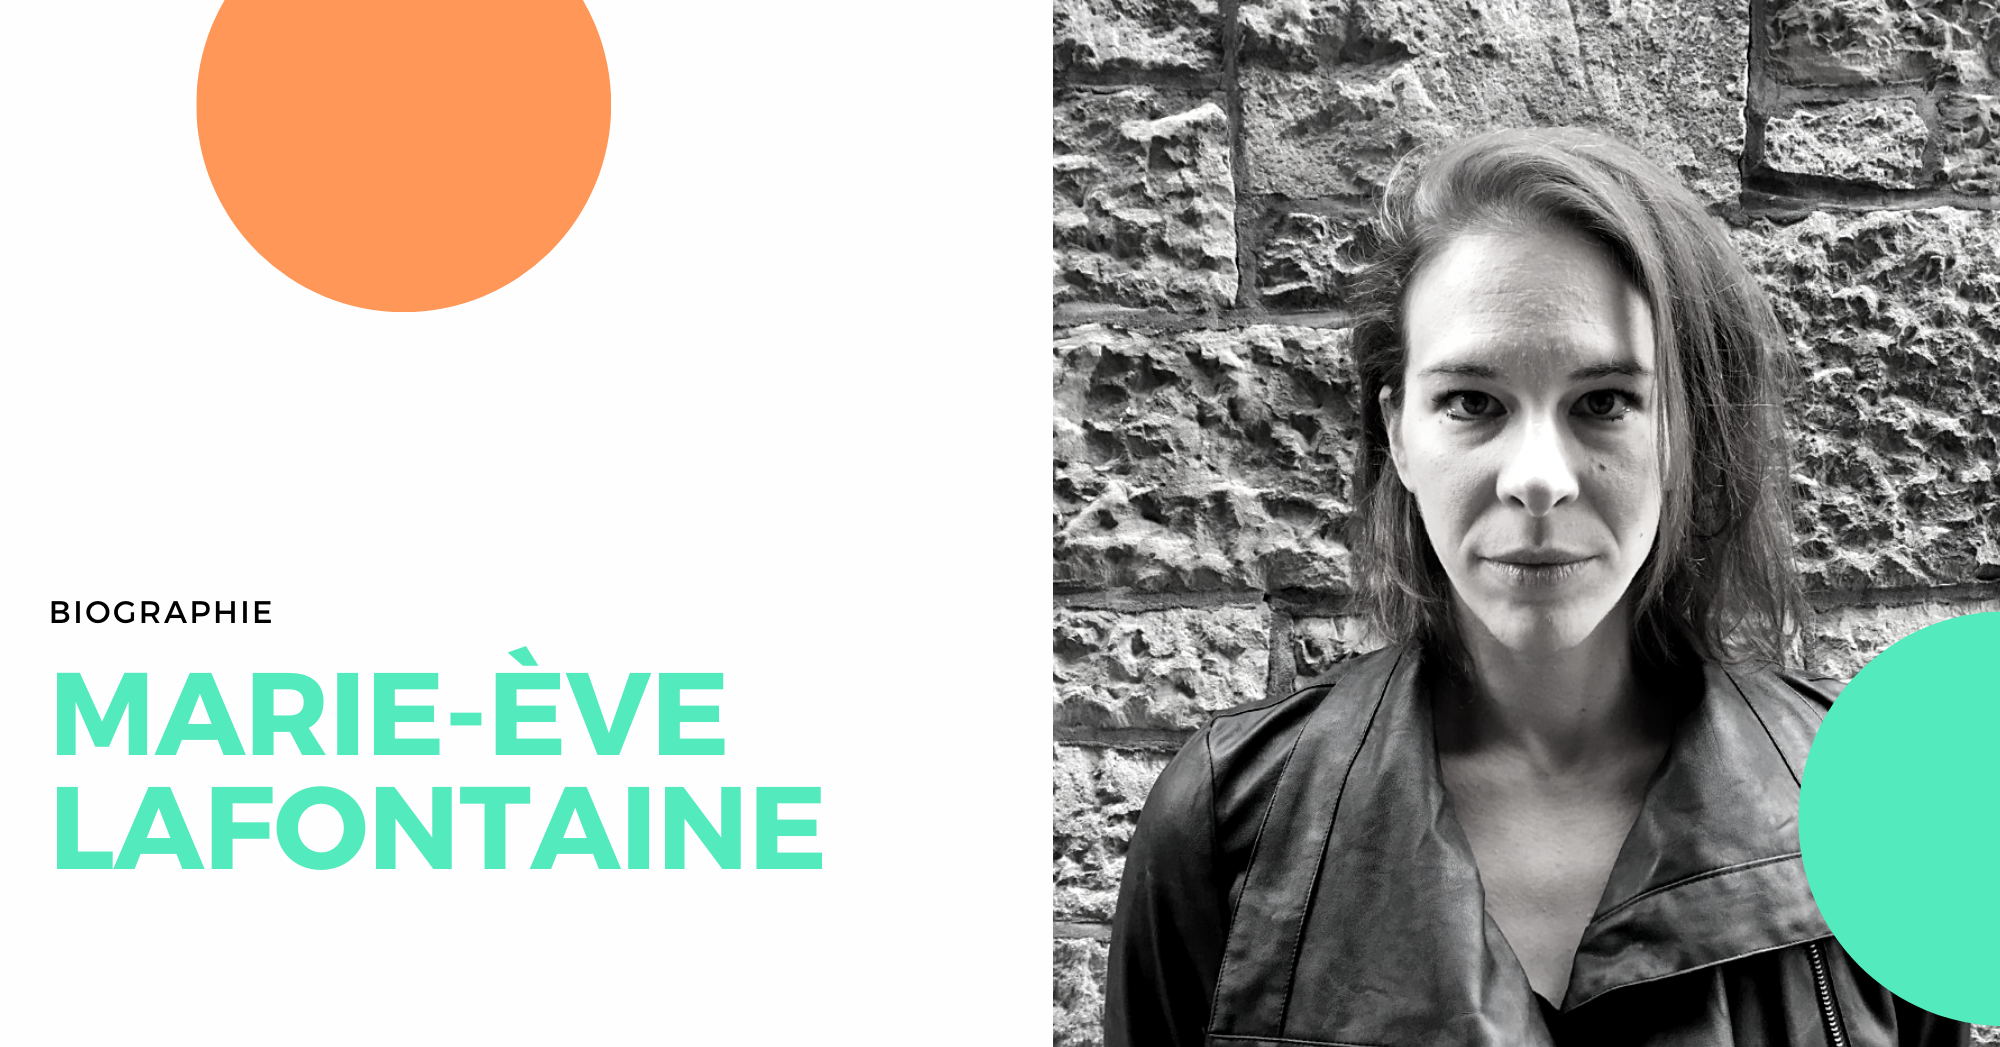 Marie-Ève Lafontaine